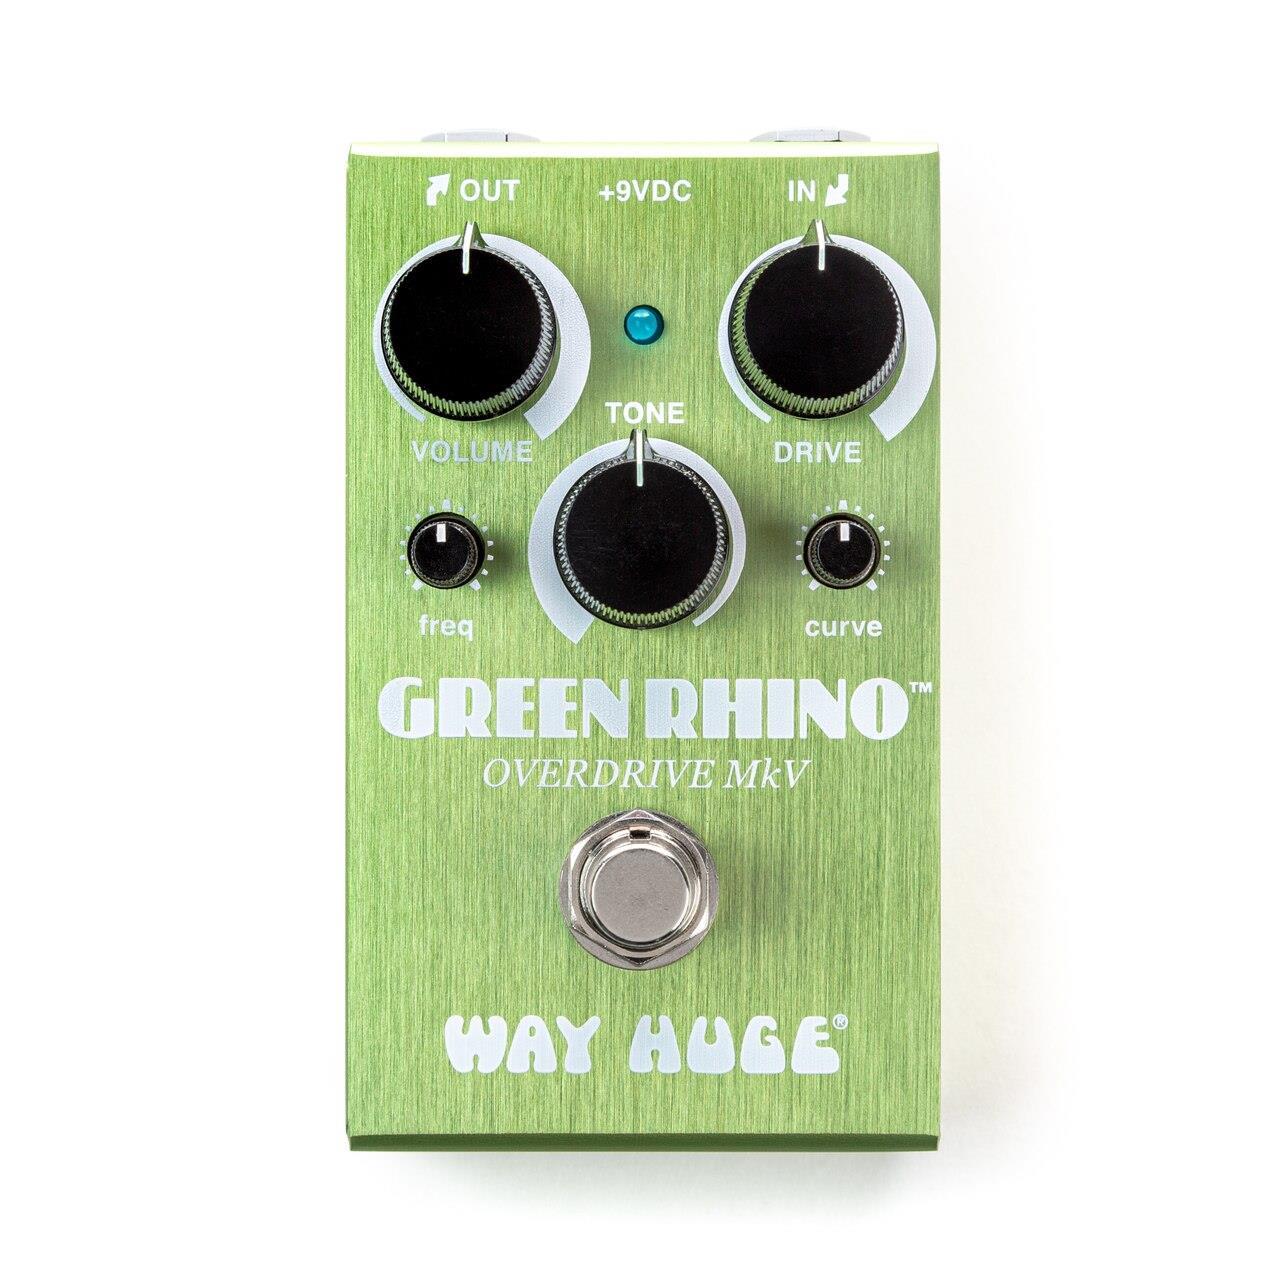 Way Huge Smalls WM22 Green Rhino MkV Overdrive pedal